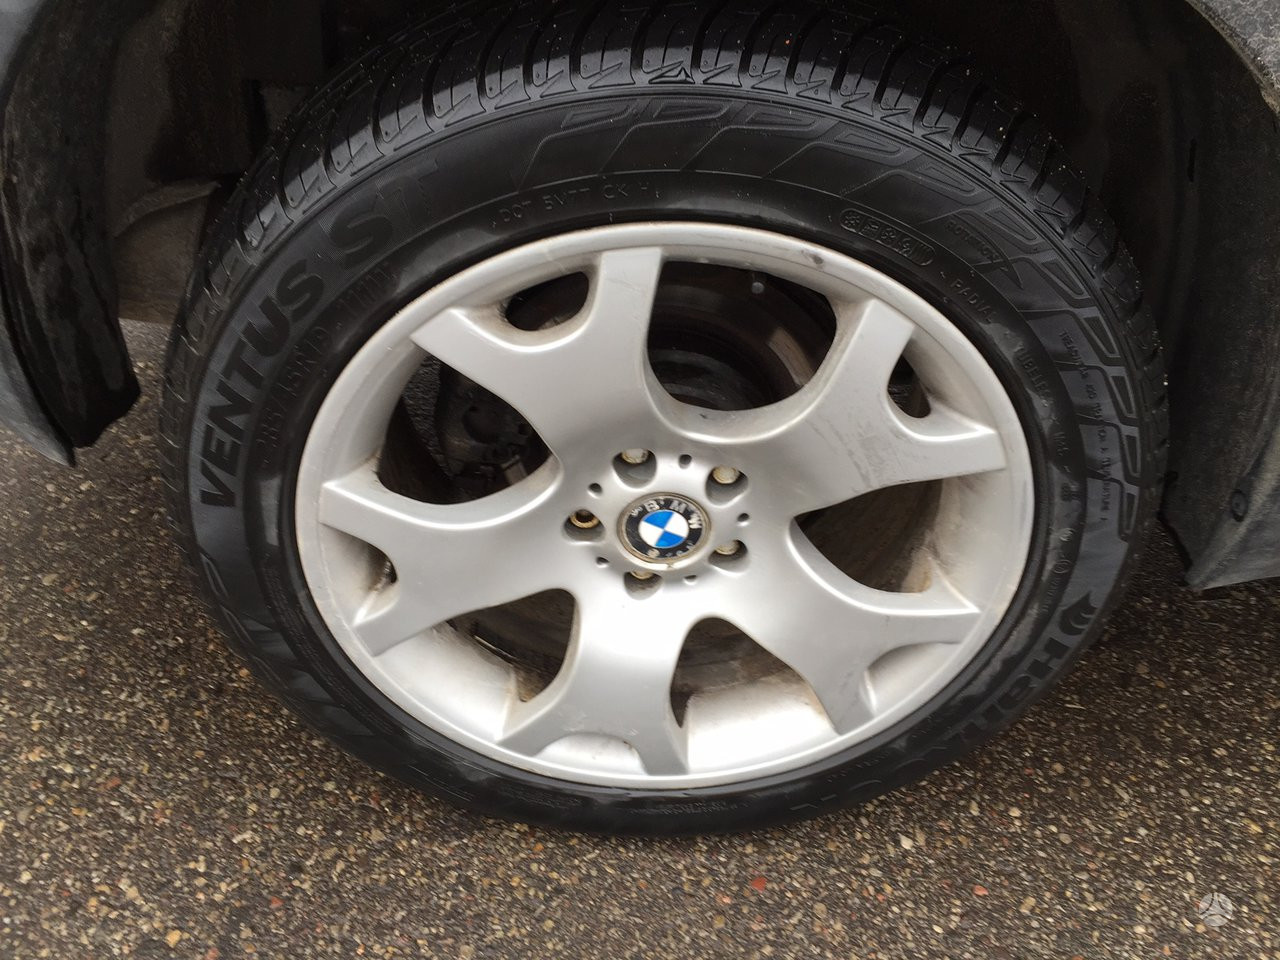 BMW X5 2003m Orginalūs Ratlankiai  90 € / vnt